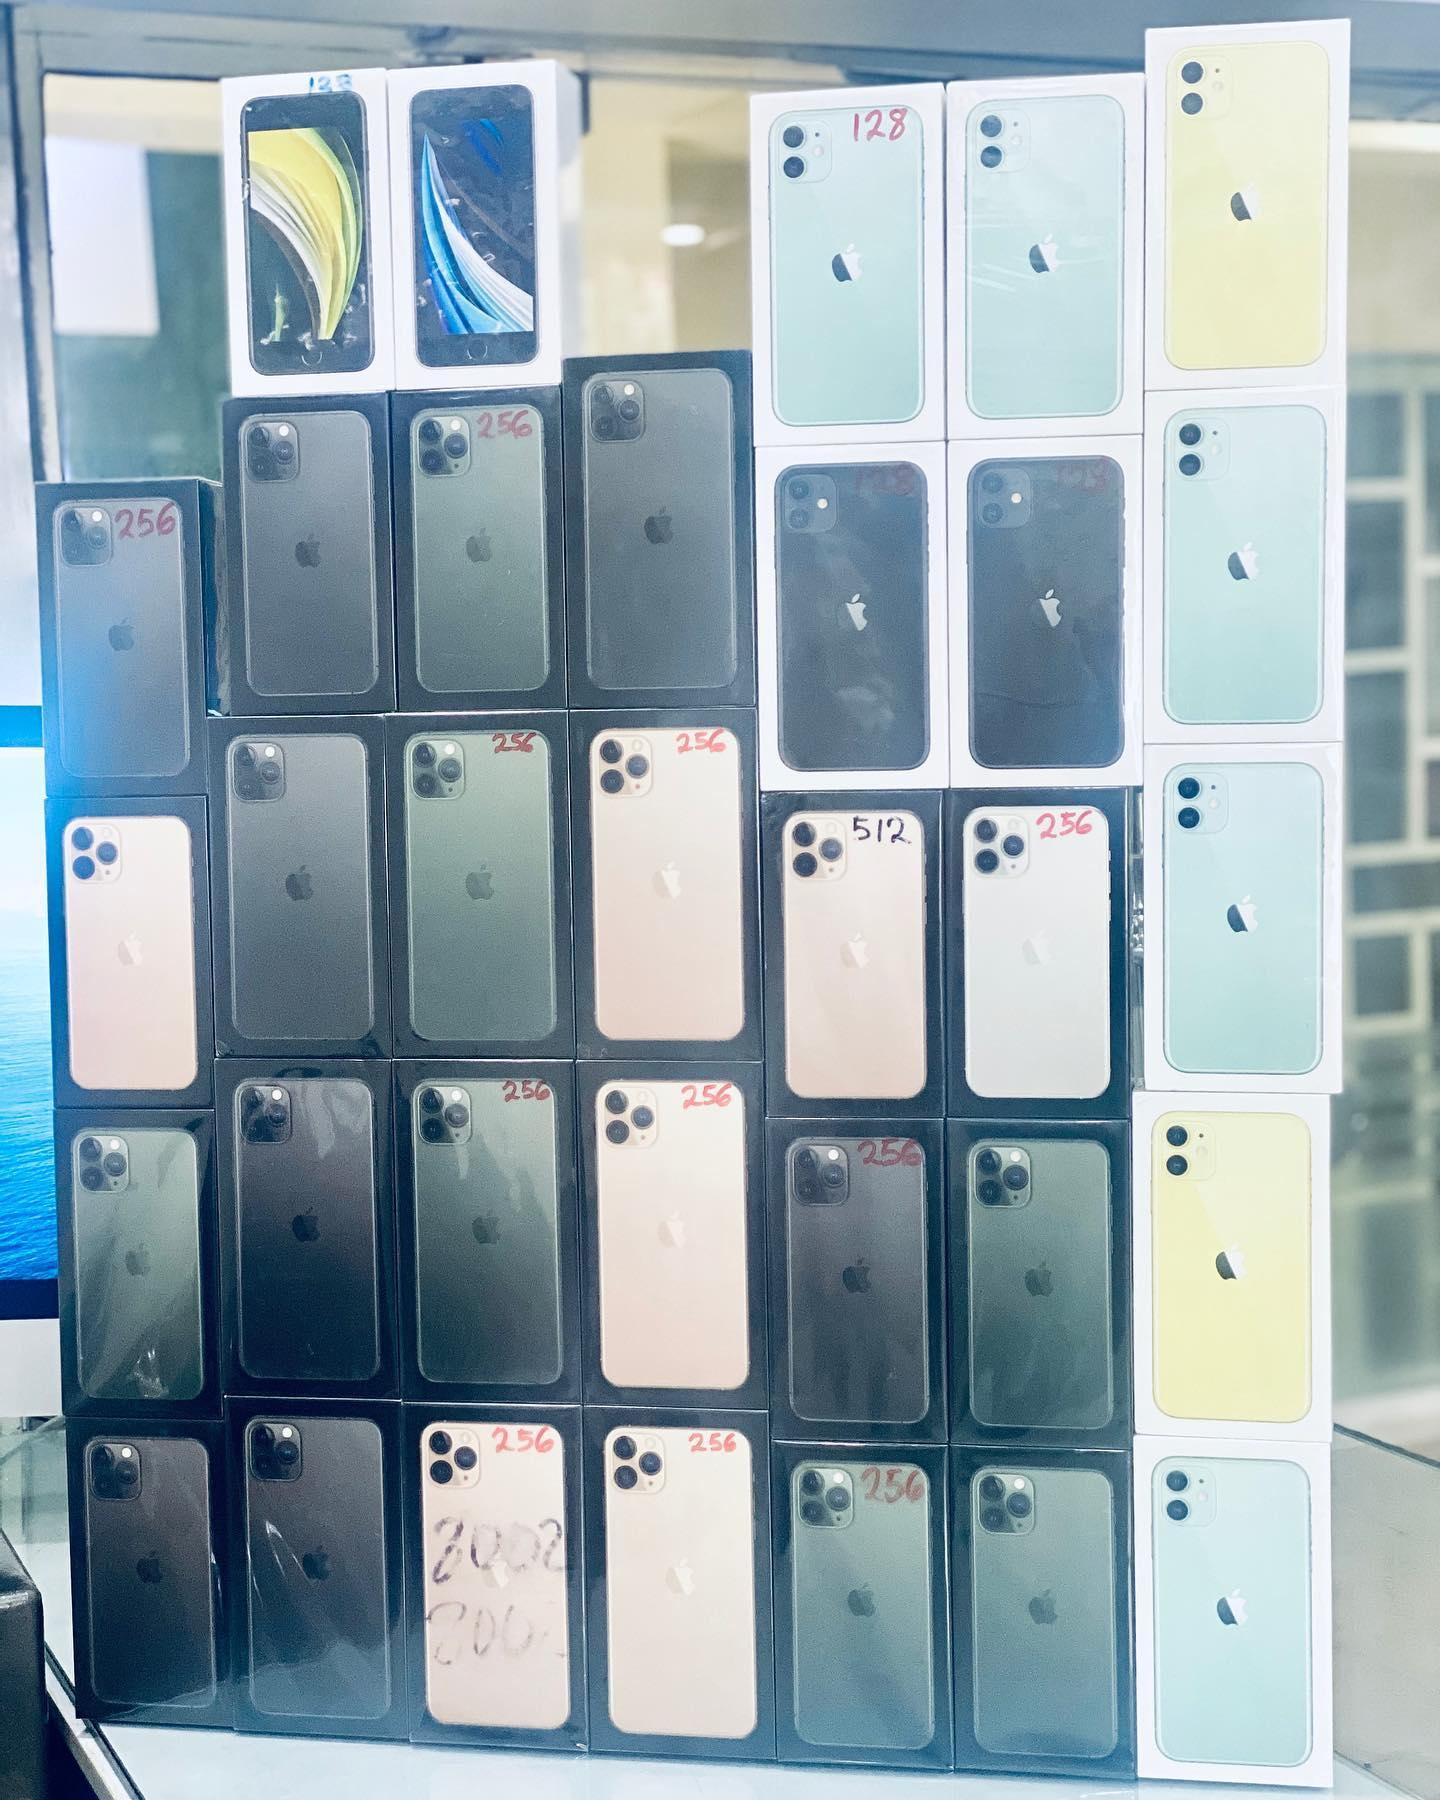 Apple iPhone 11 Pro / Pro Max - 512GB - 256GB 64GB (Factorty